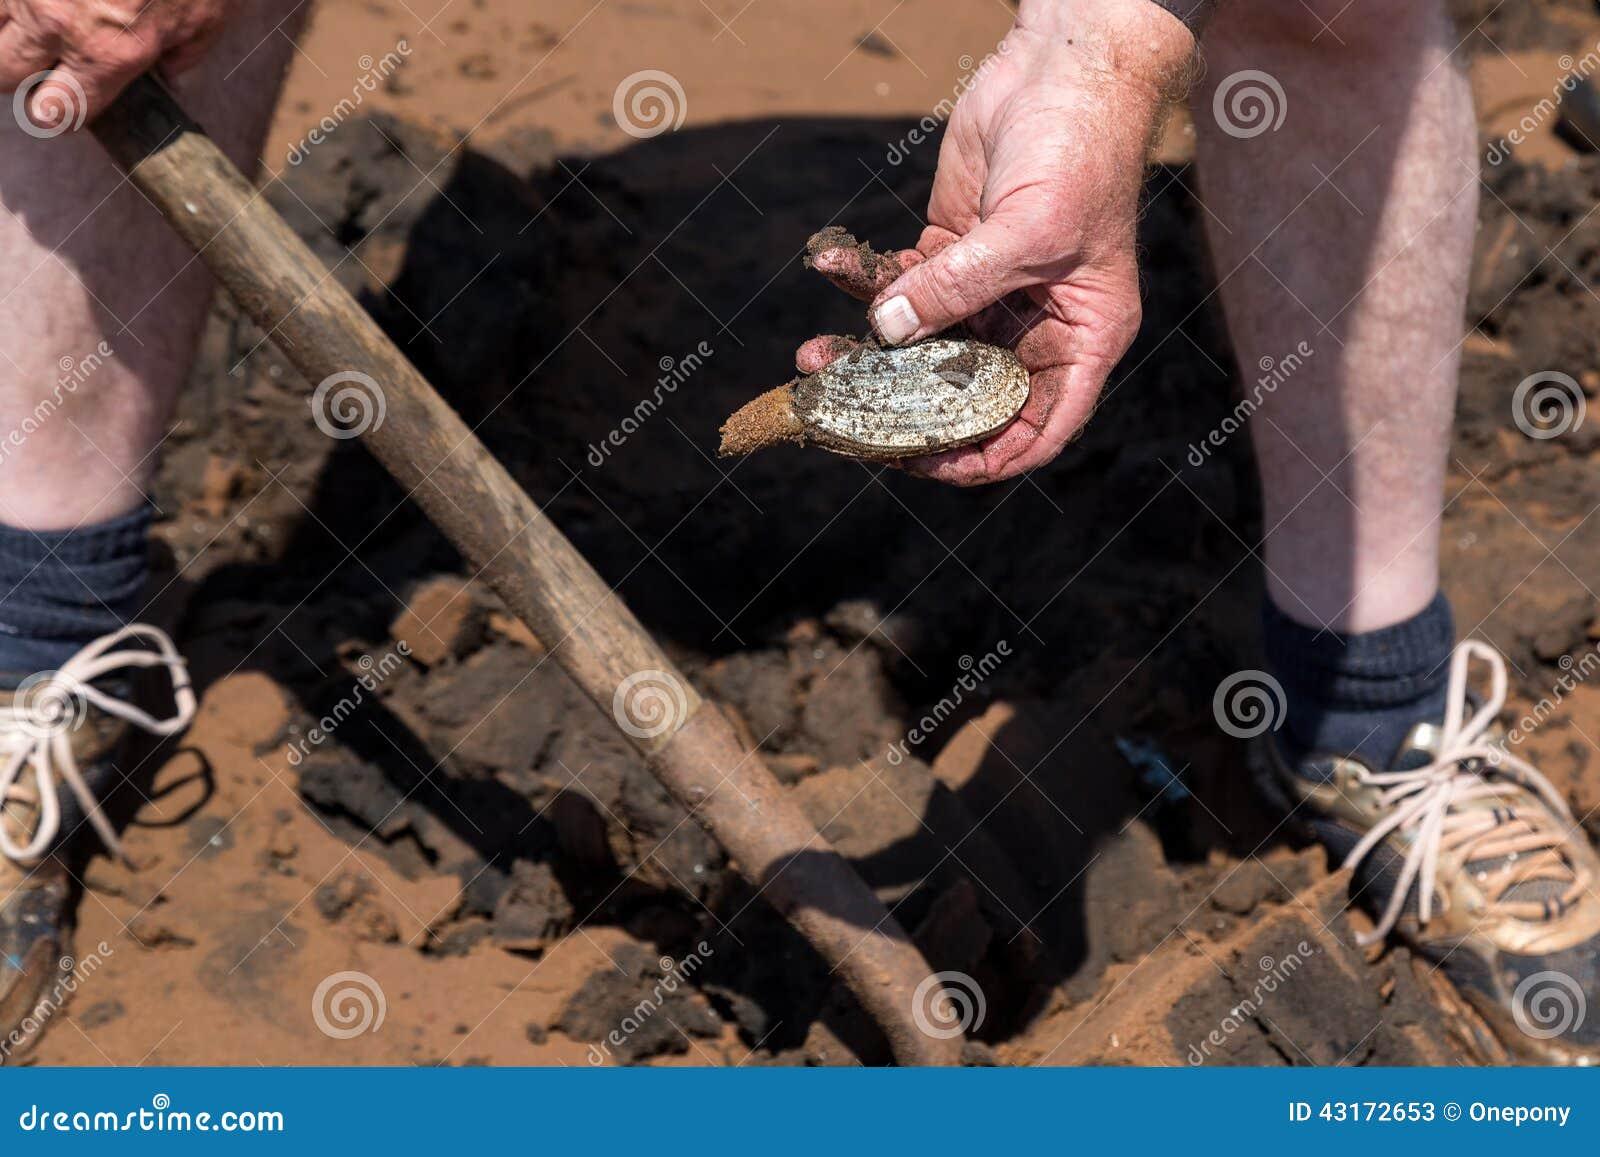 Digging Clams